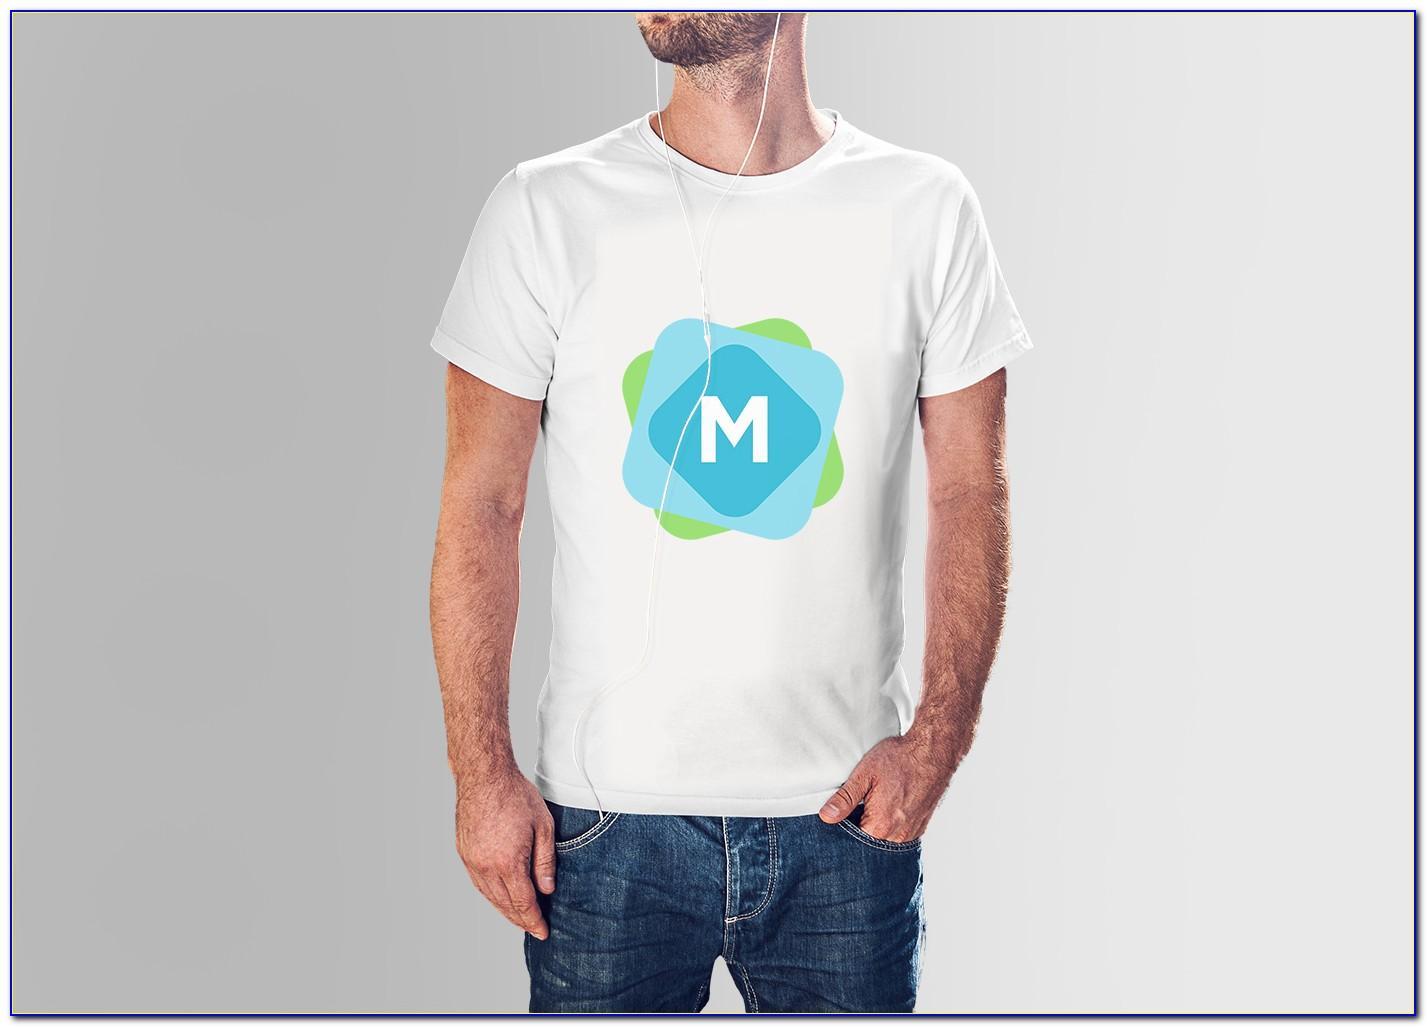 T Shirt Design Mockup Psd Free Download